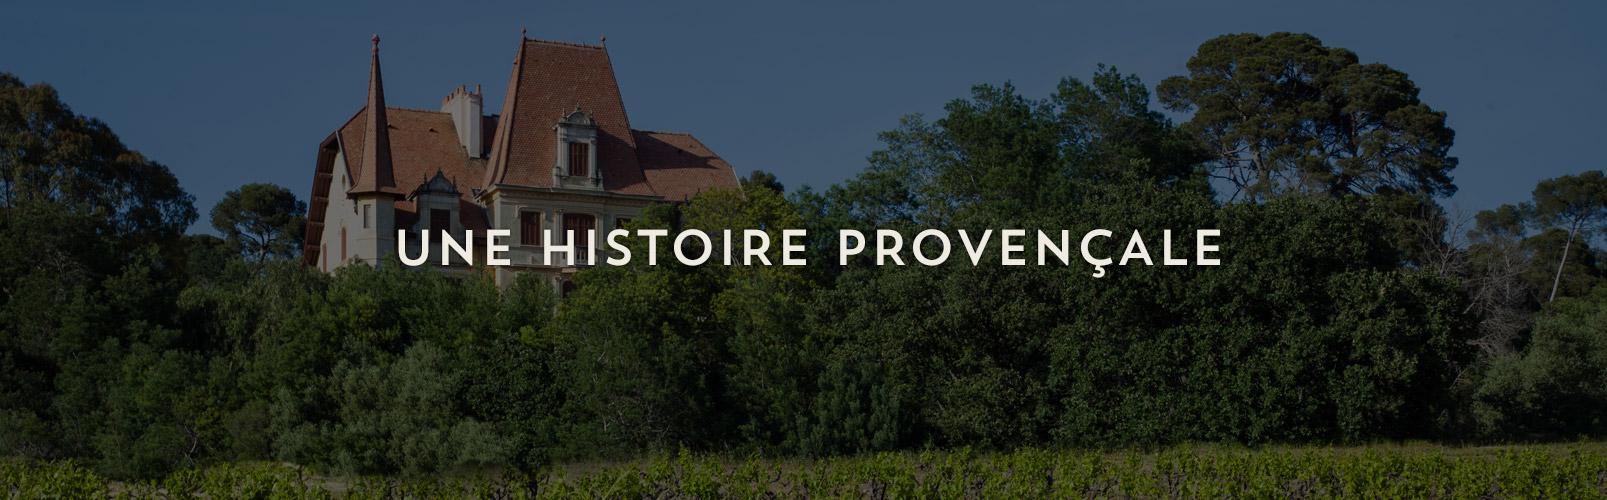 vin-chateau-bormettes-slider-11